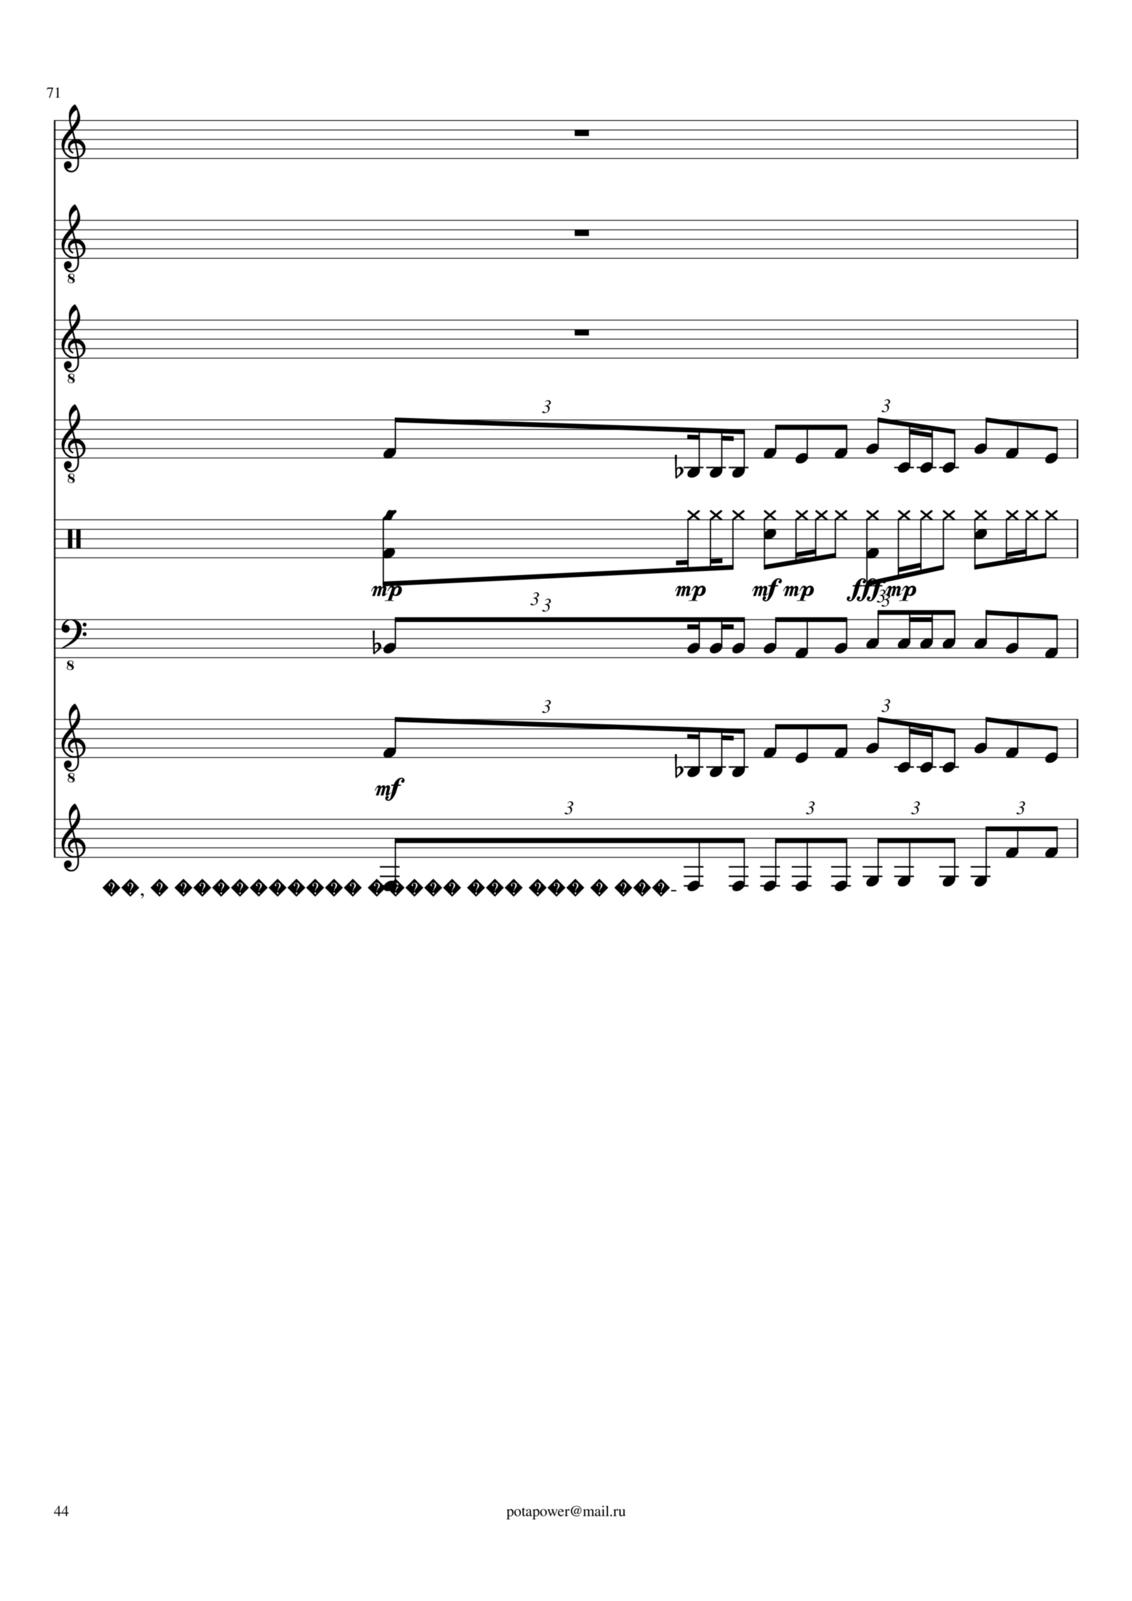 Korolevstvo slez slide, Image 44